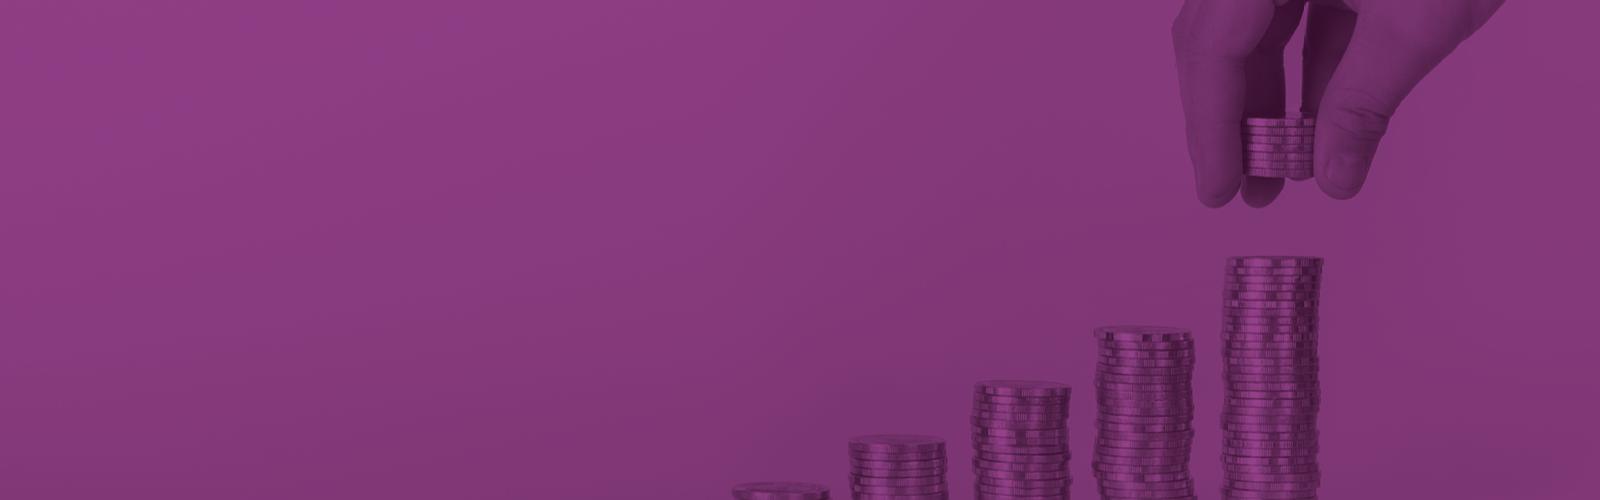 salary sacrifice_web banner_2017.png